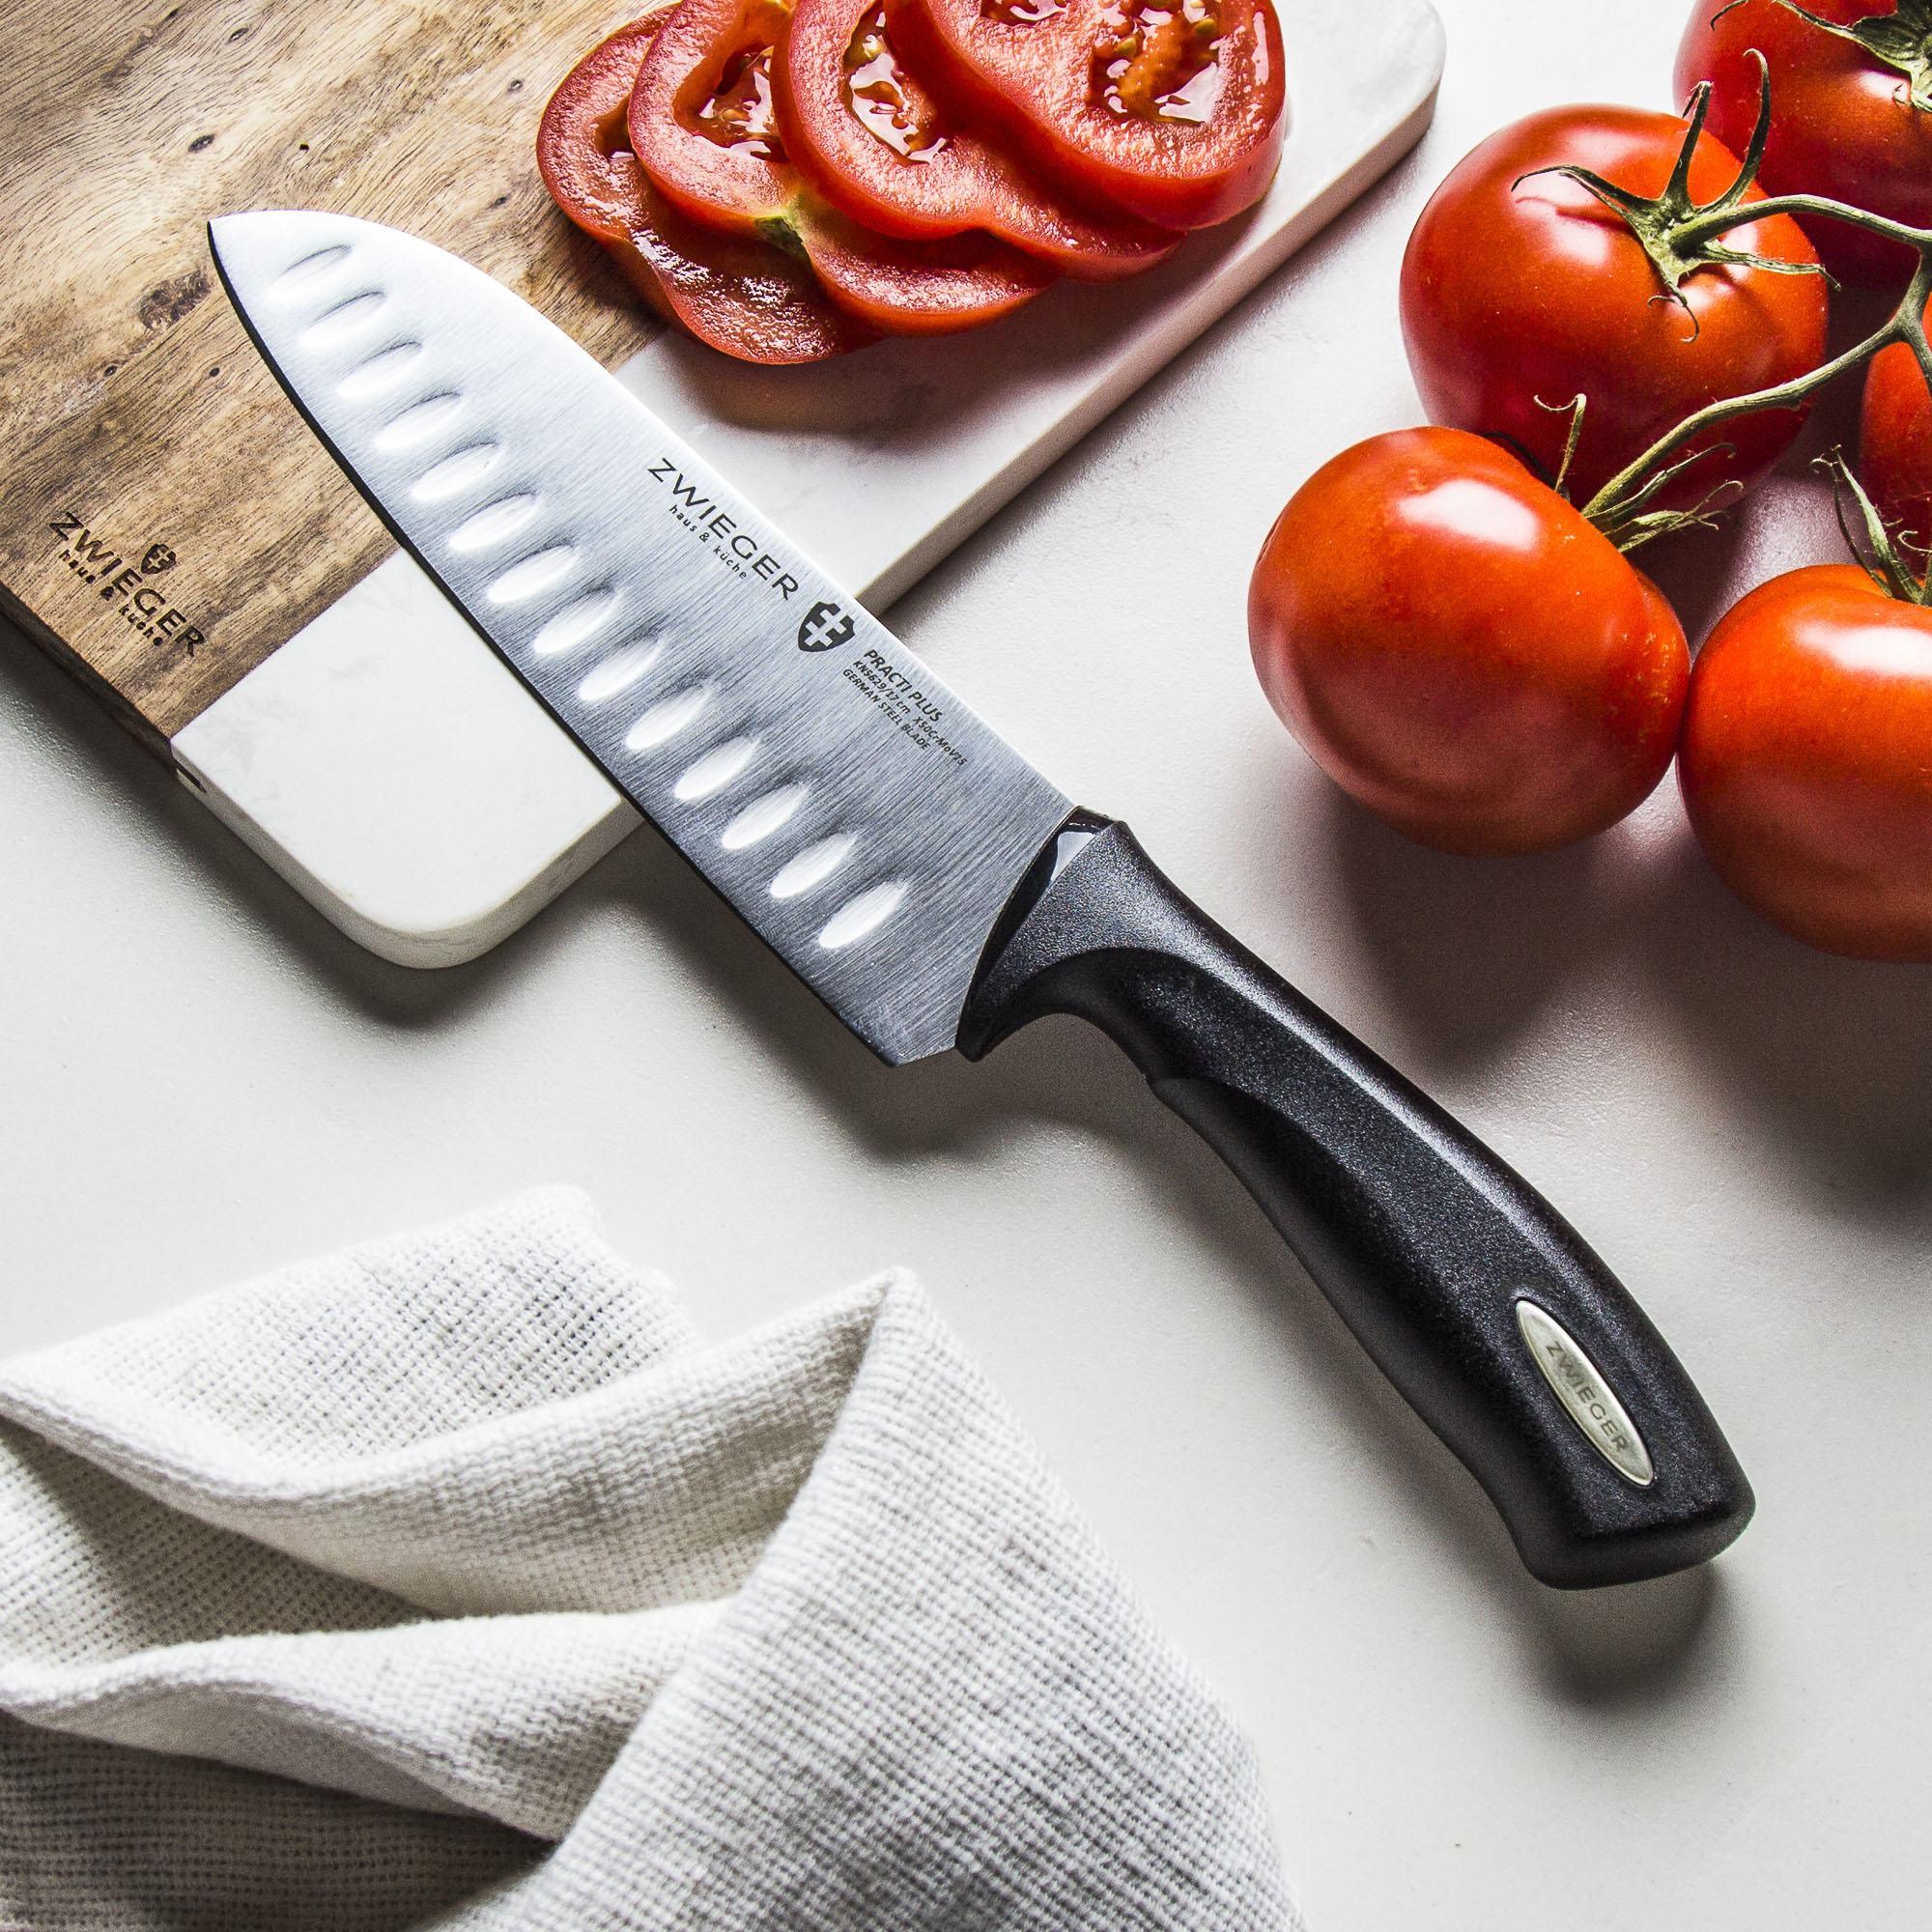 cuchillo y tomates